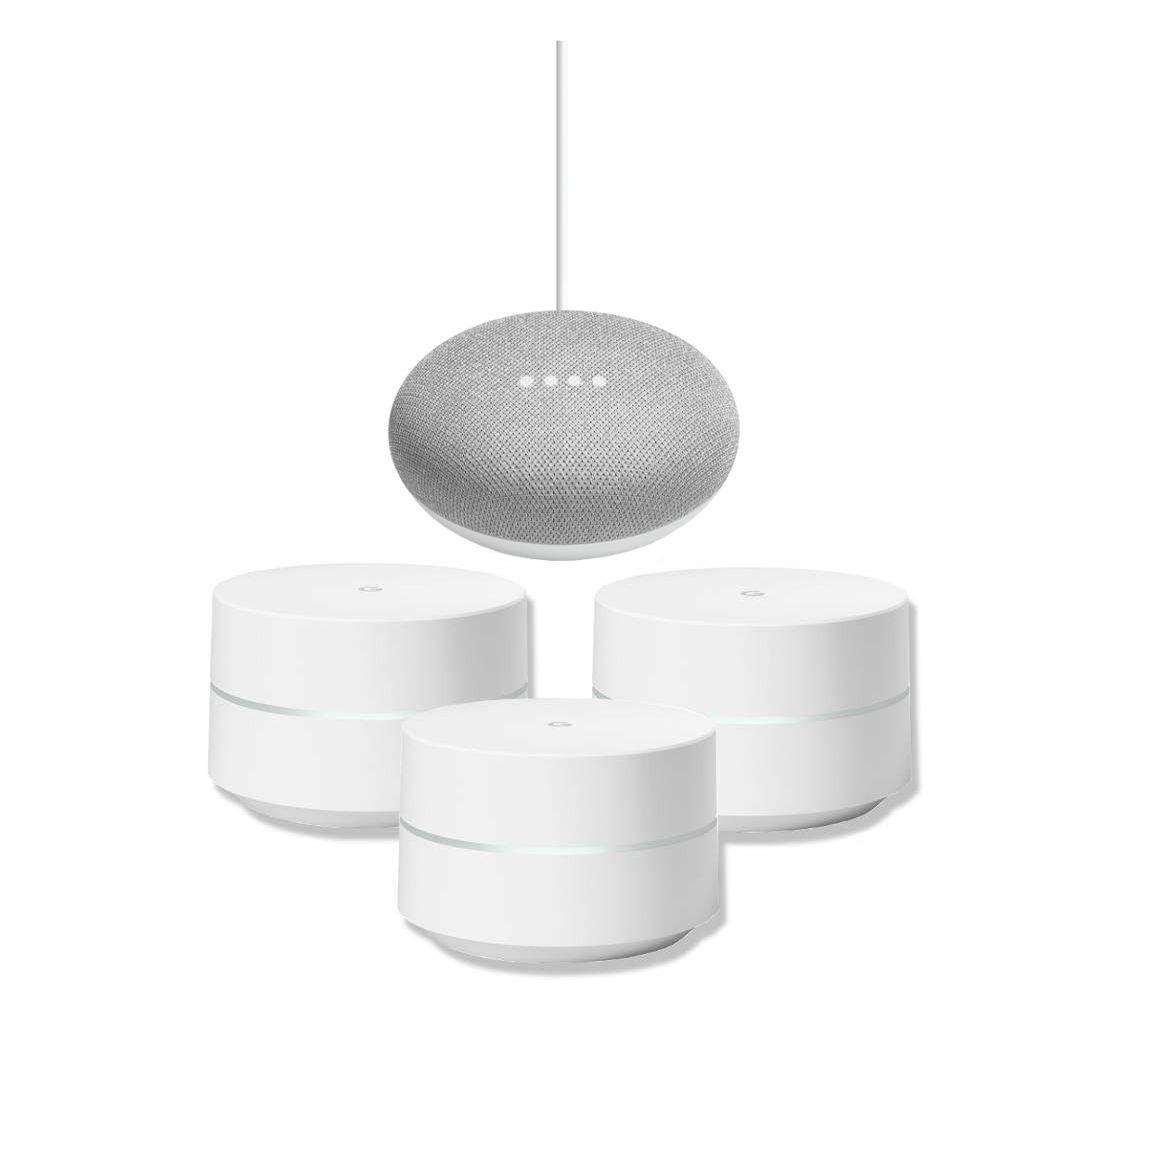 Google Nest Google Wifi Dreierpack + Google Home Mini